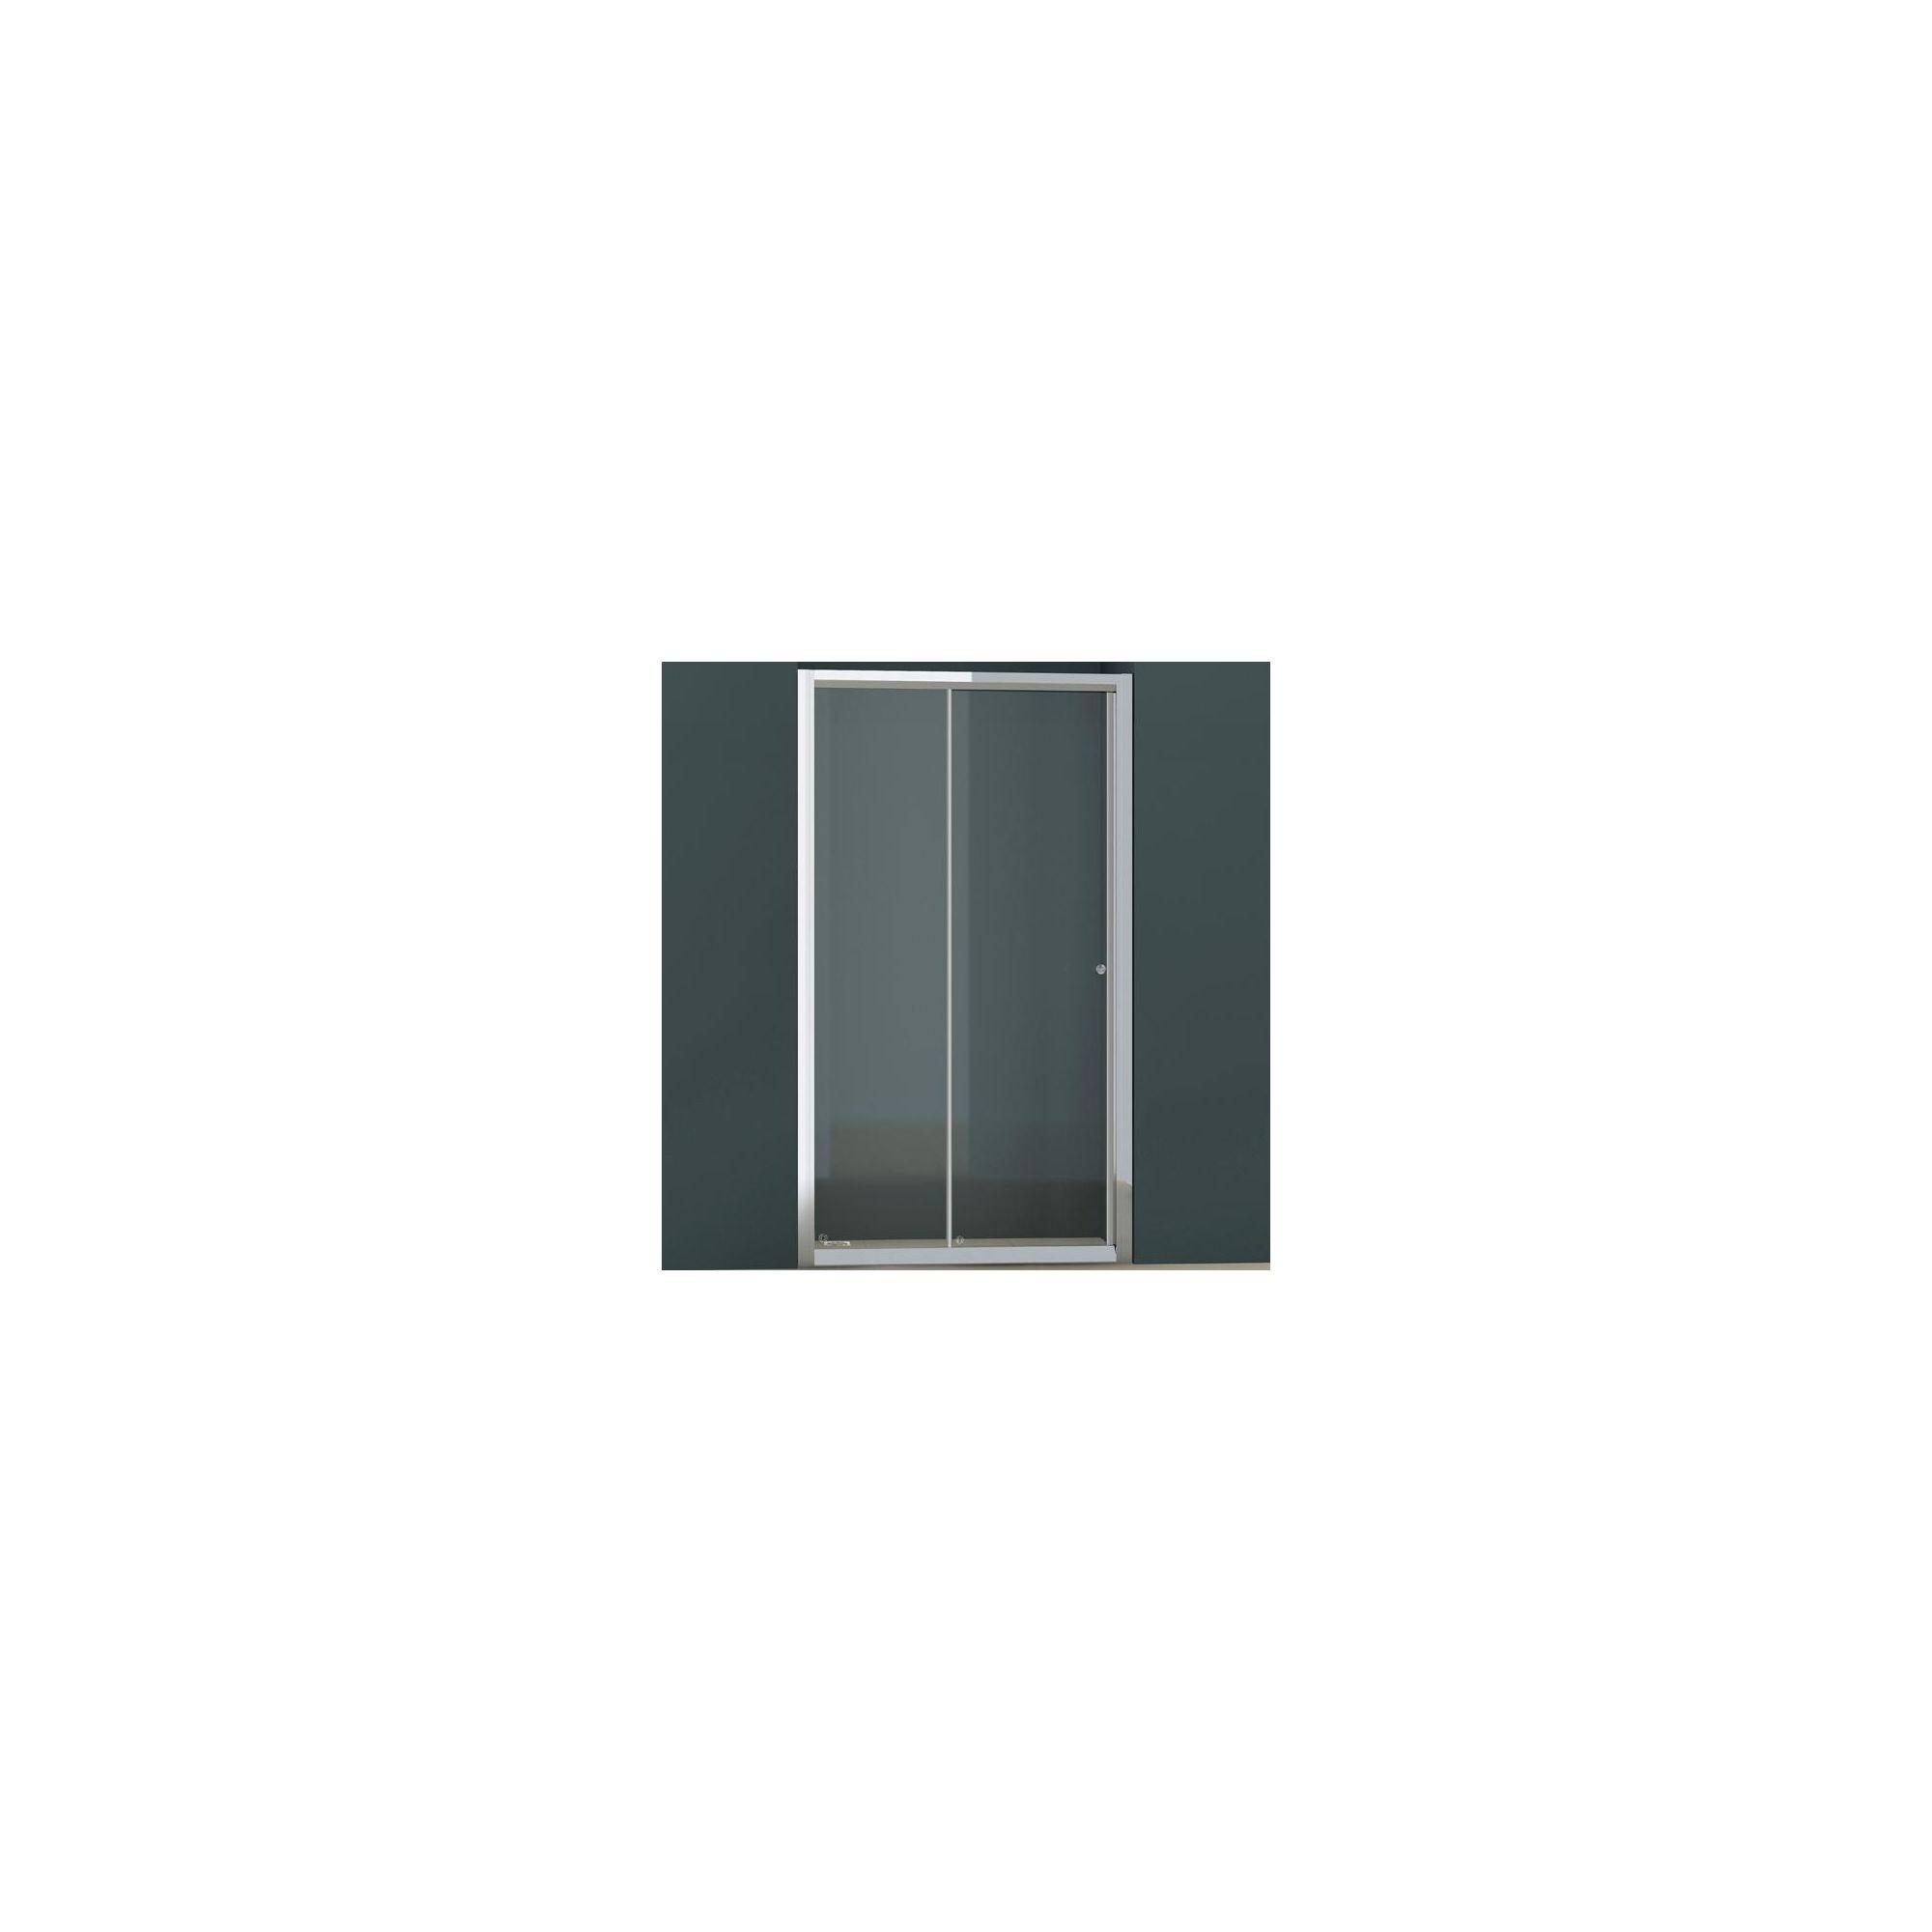 Vessini E Series Sliding Shower Door, 1000mm Wide, 6mm Glass at Tesco Direct